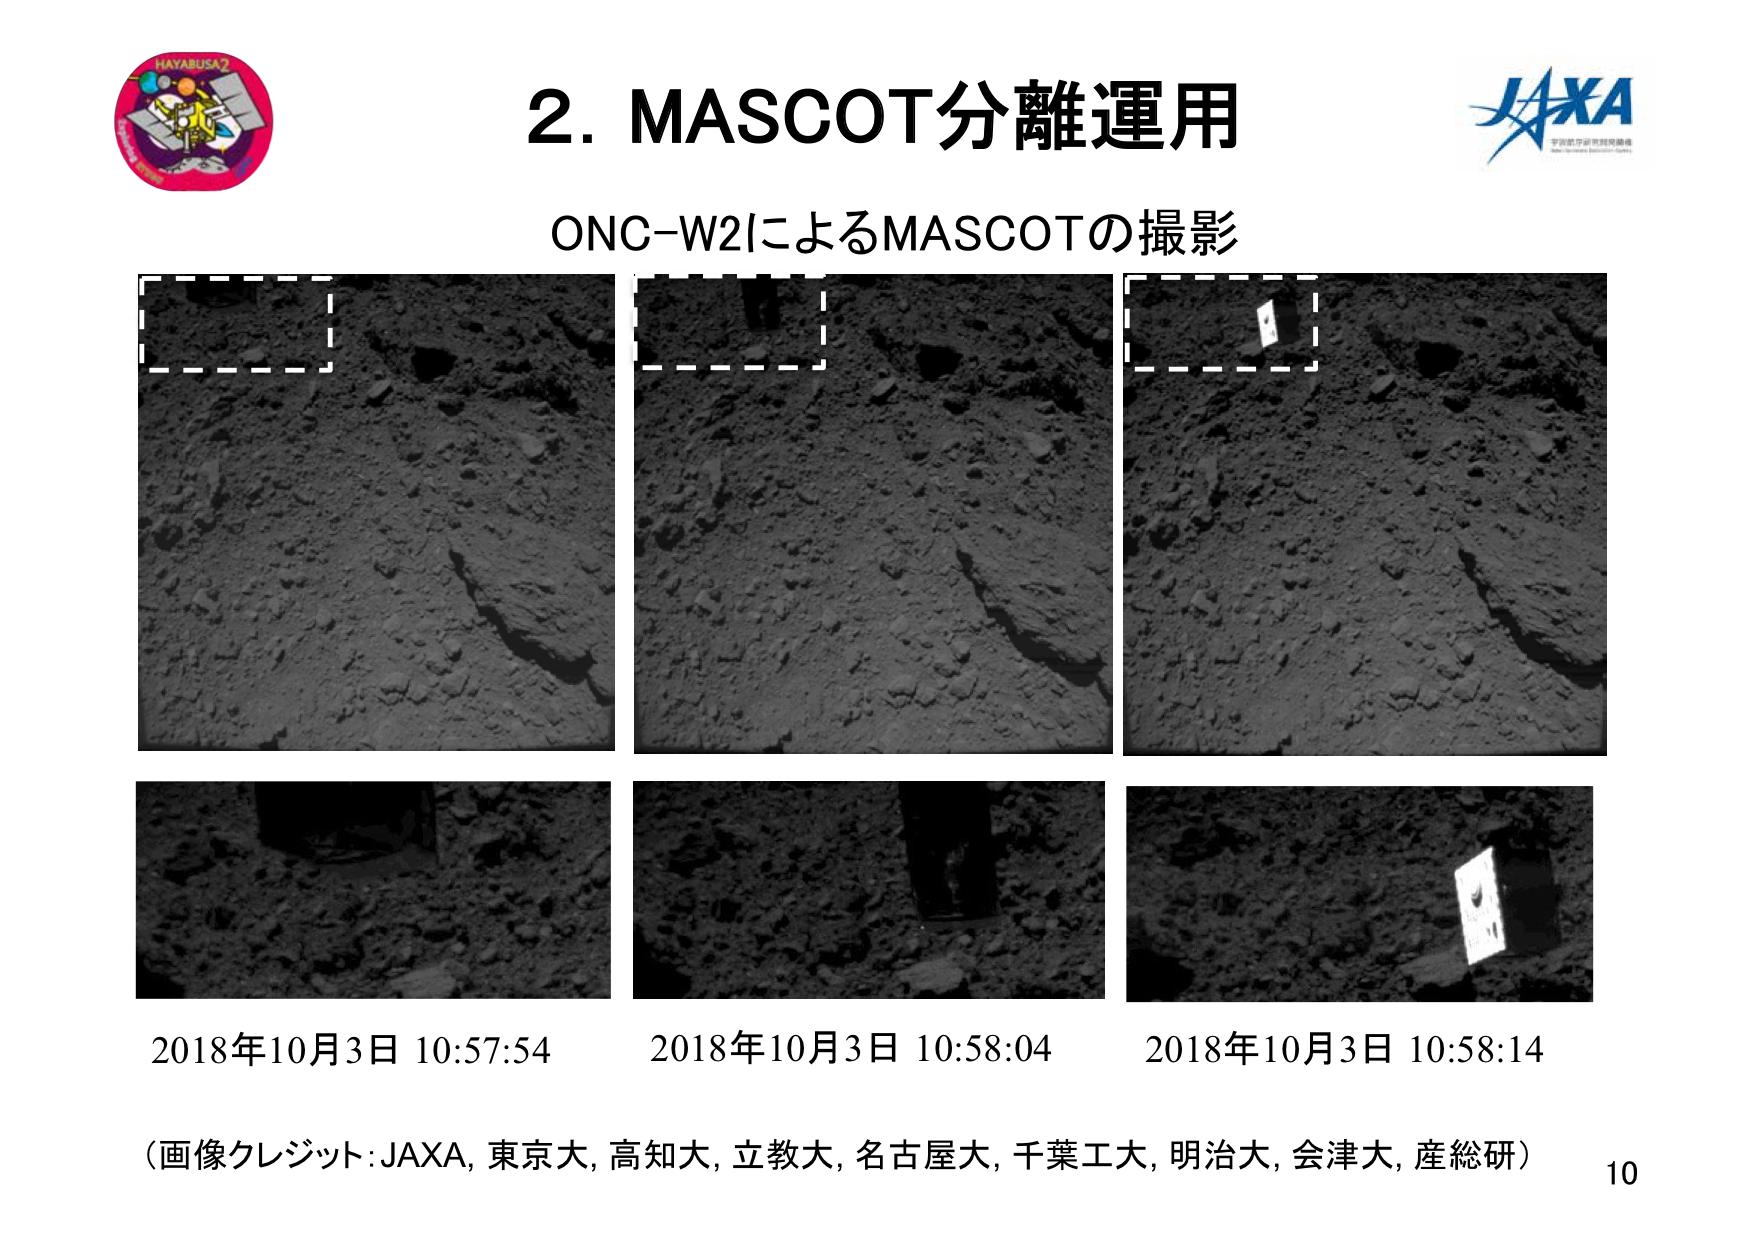 f:id:Imamura:20181011153949p:plain